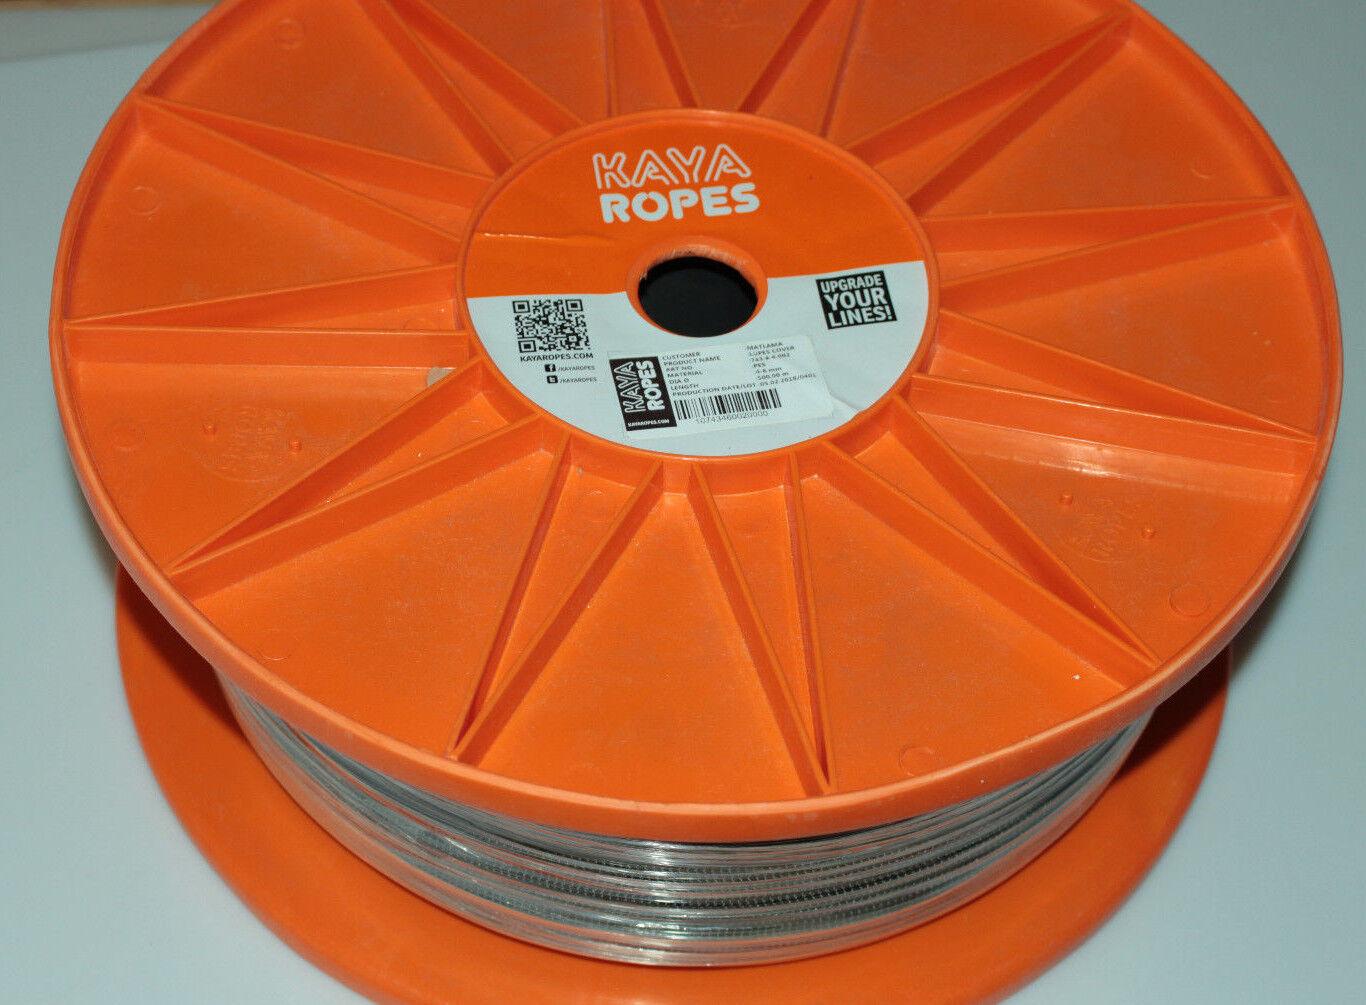 Seil 500m schwarz Kaya Ropes 10-12mm 743.10-12.002 Lupes Cover PES Schnur Tau